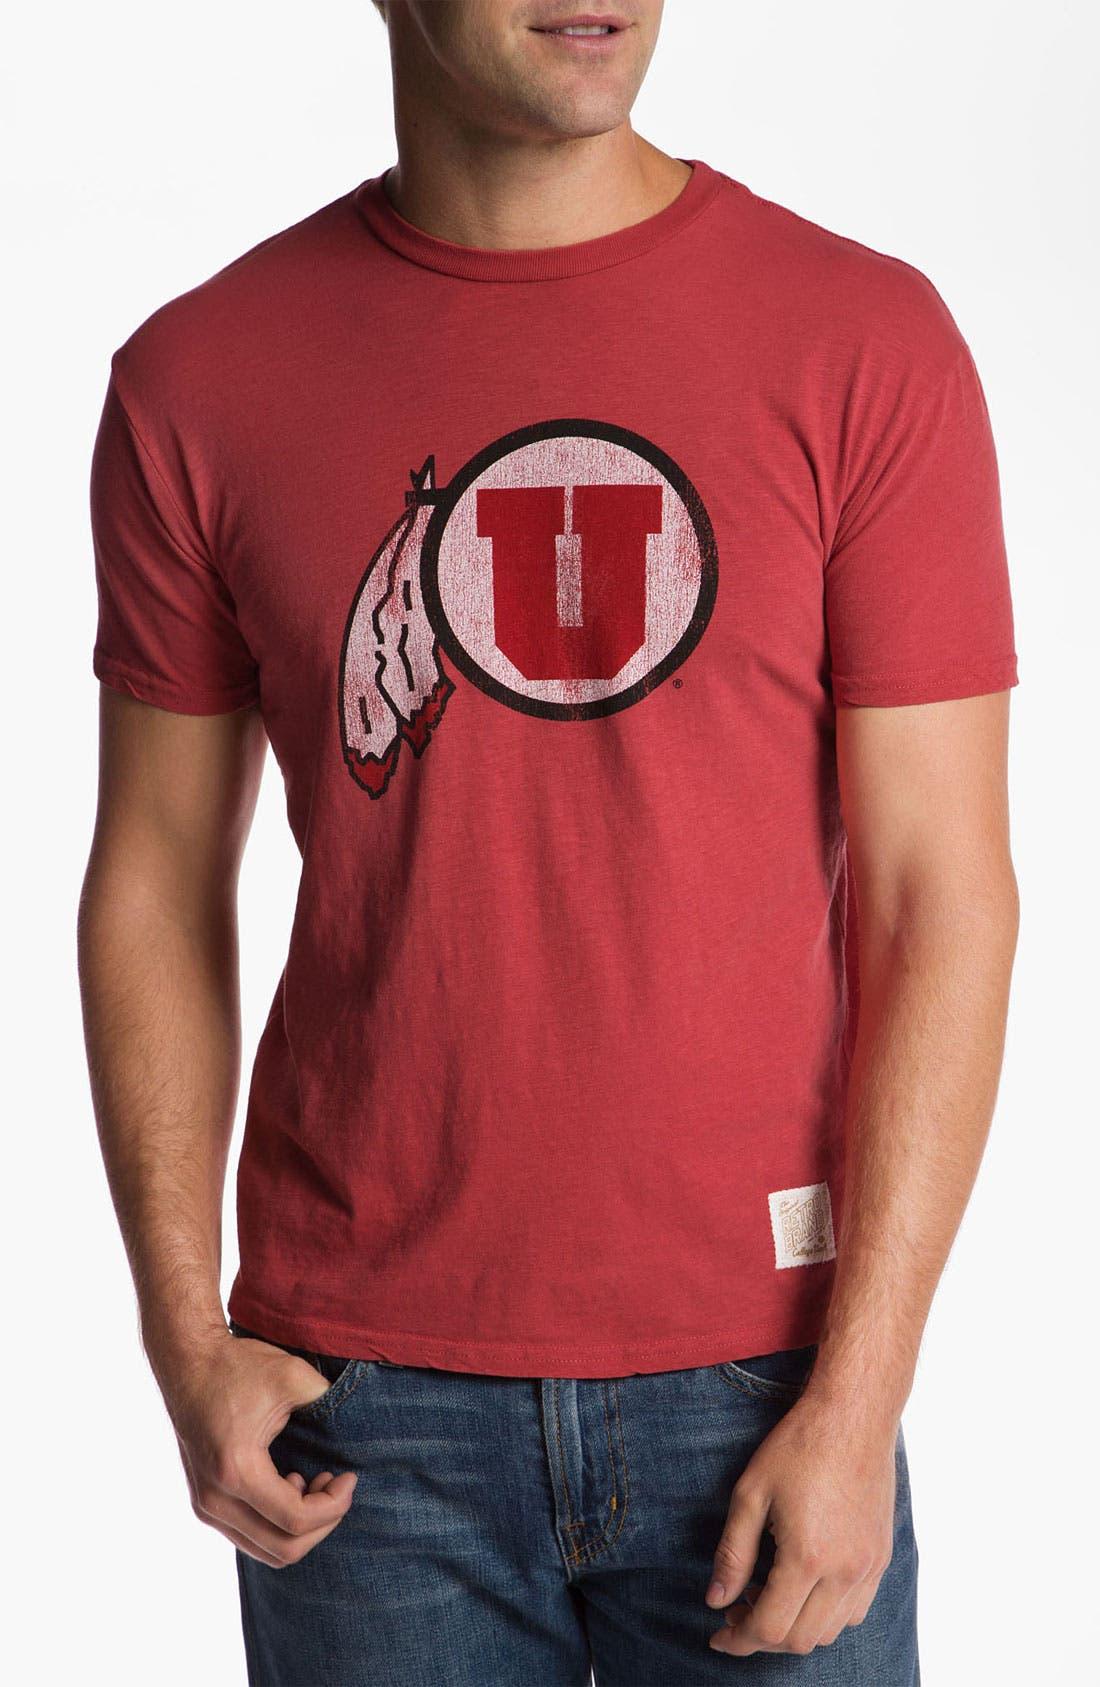 Main Image - The Original Retro Brand 'University of Utah' T-Shirt